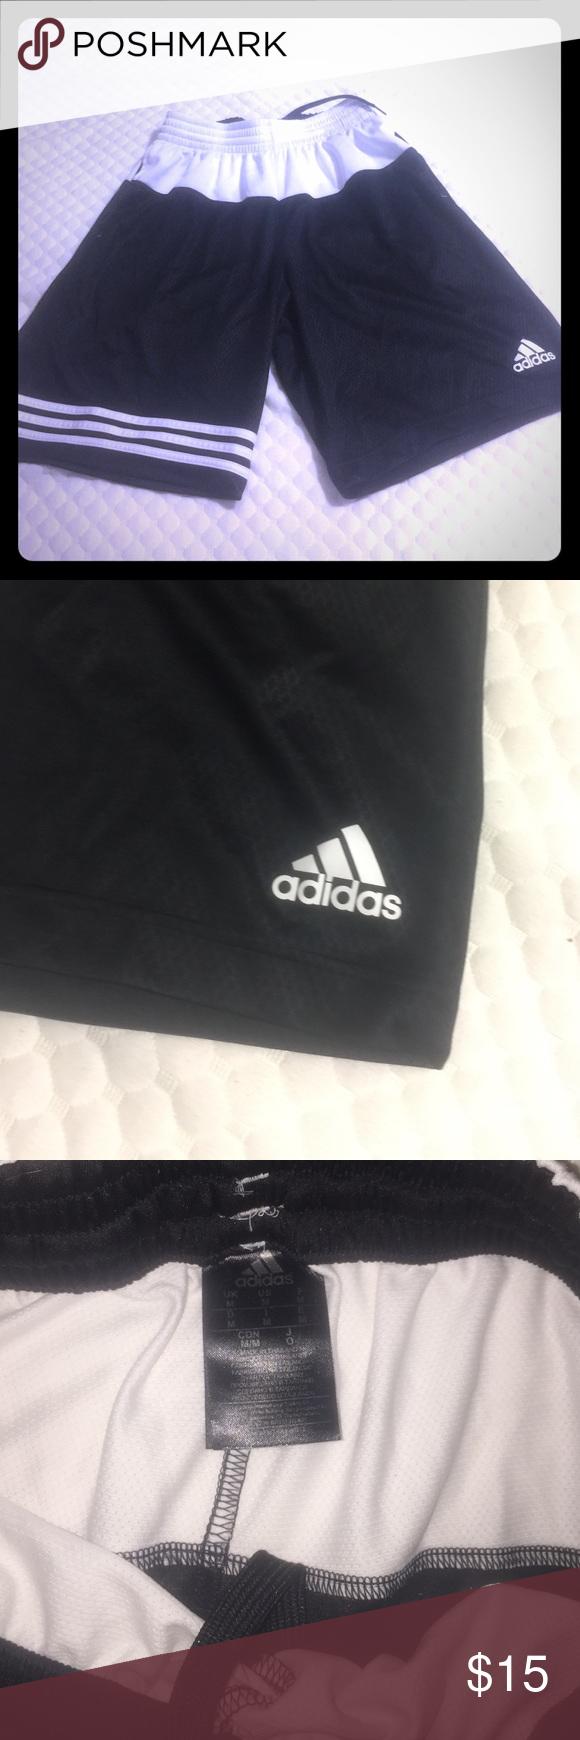 Men's athletic shorts Men's Adidas athletic shorts. EUC Adidas Shorts Athletic